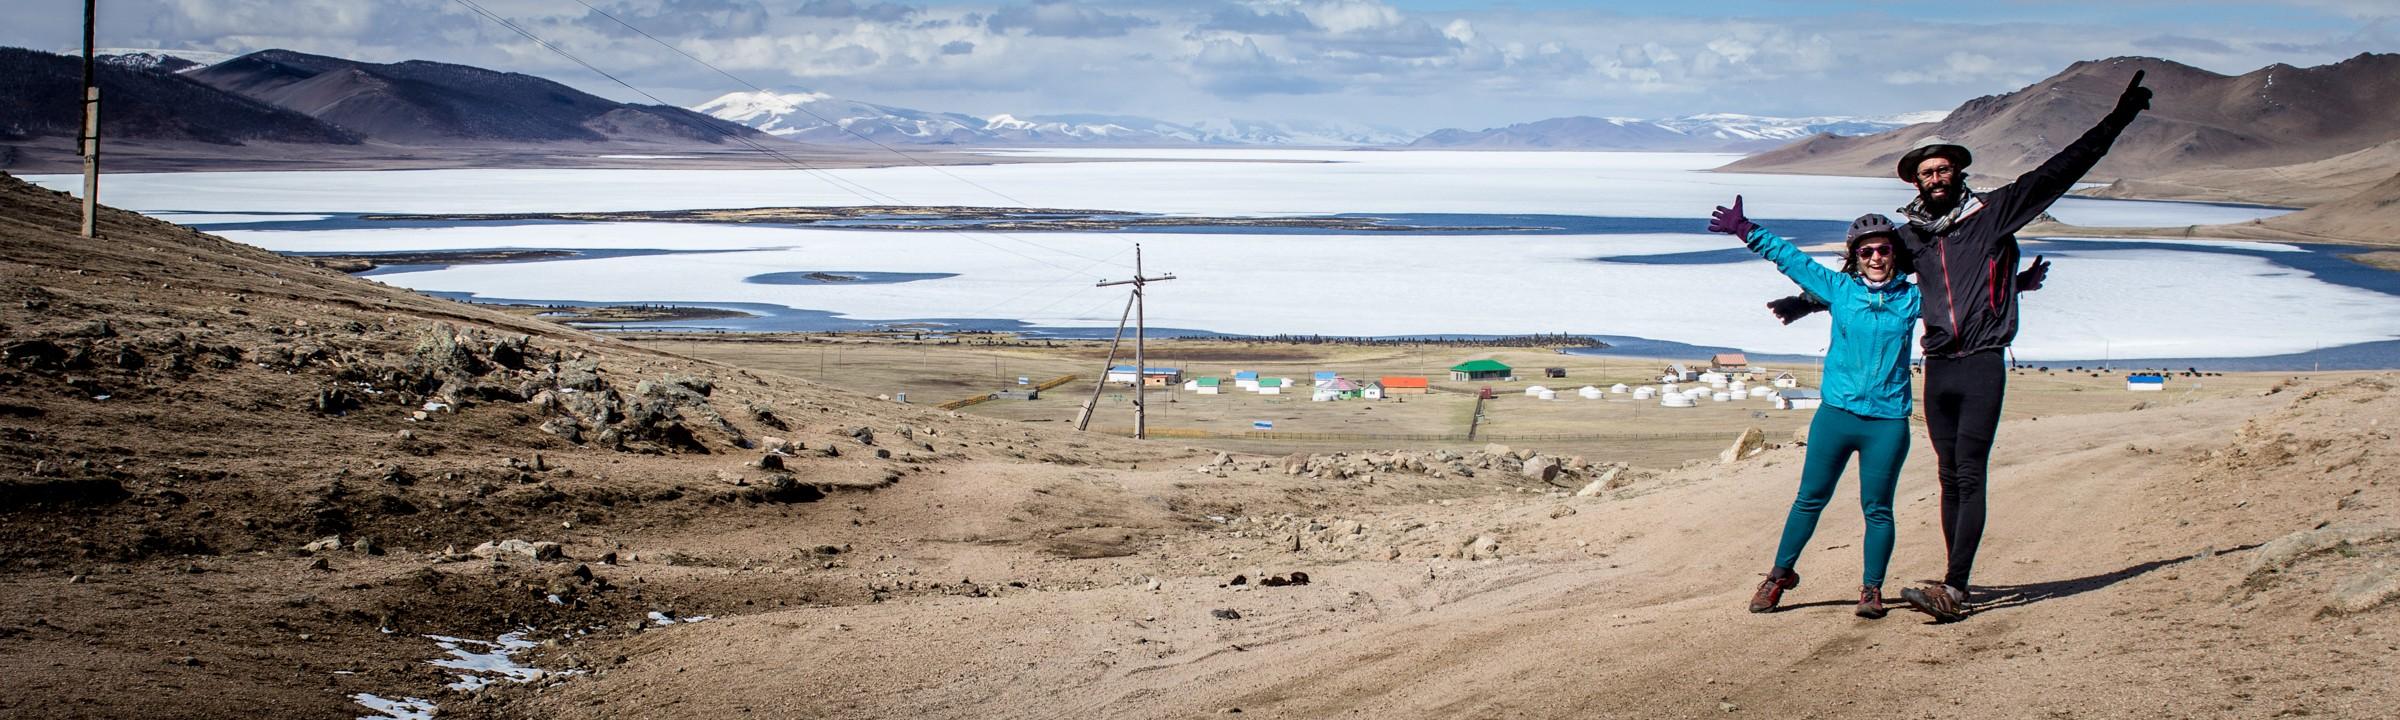 Lac Terkhiin : le lac blanc